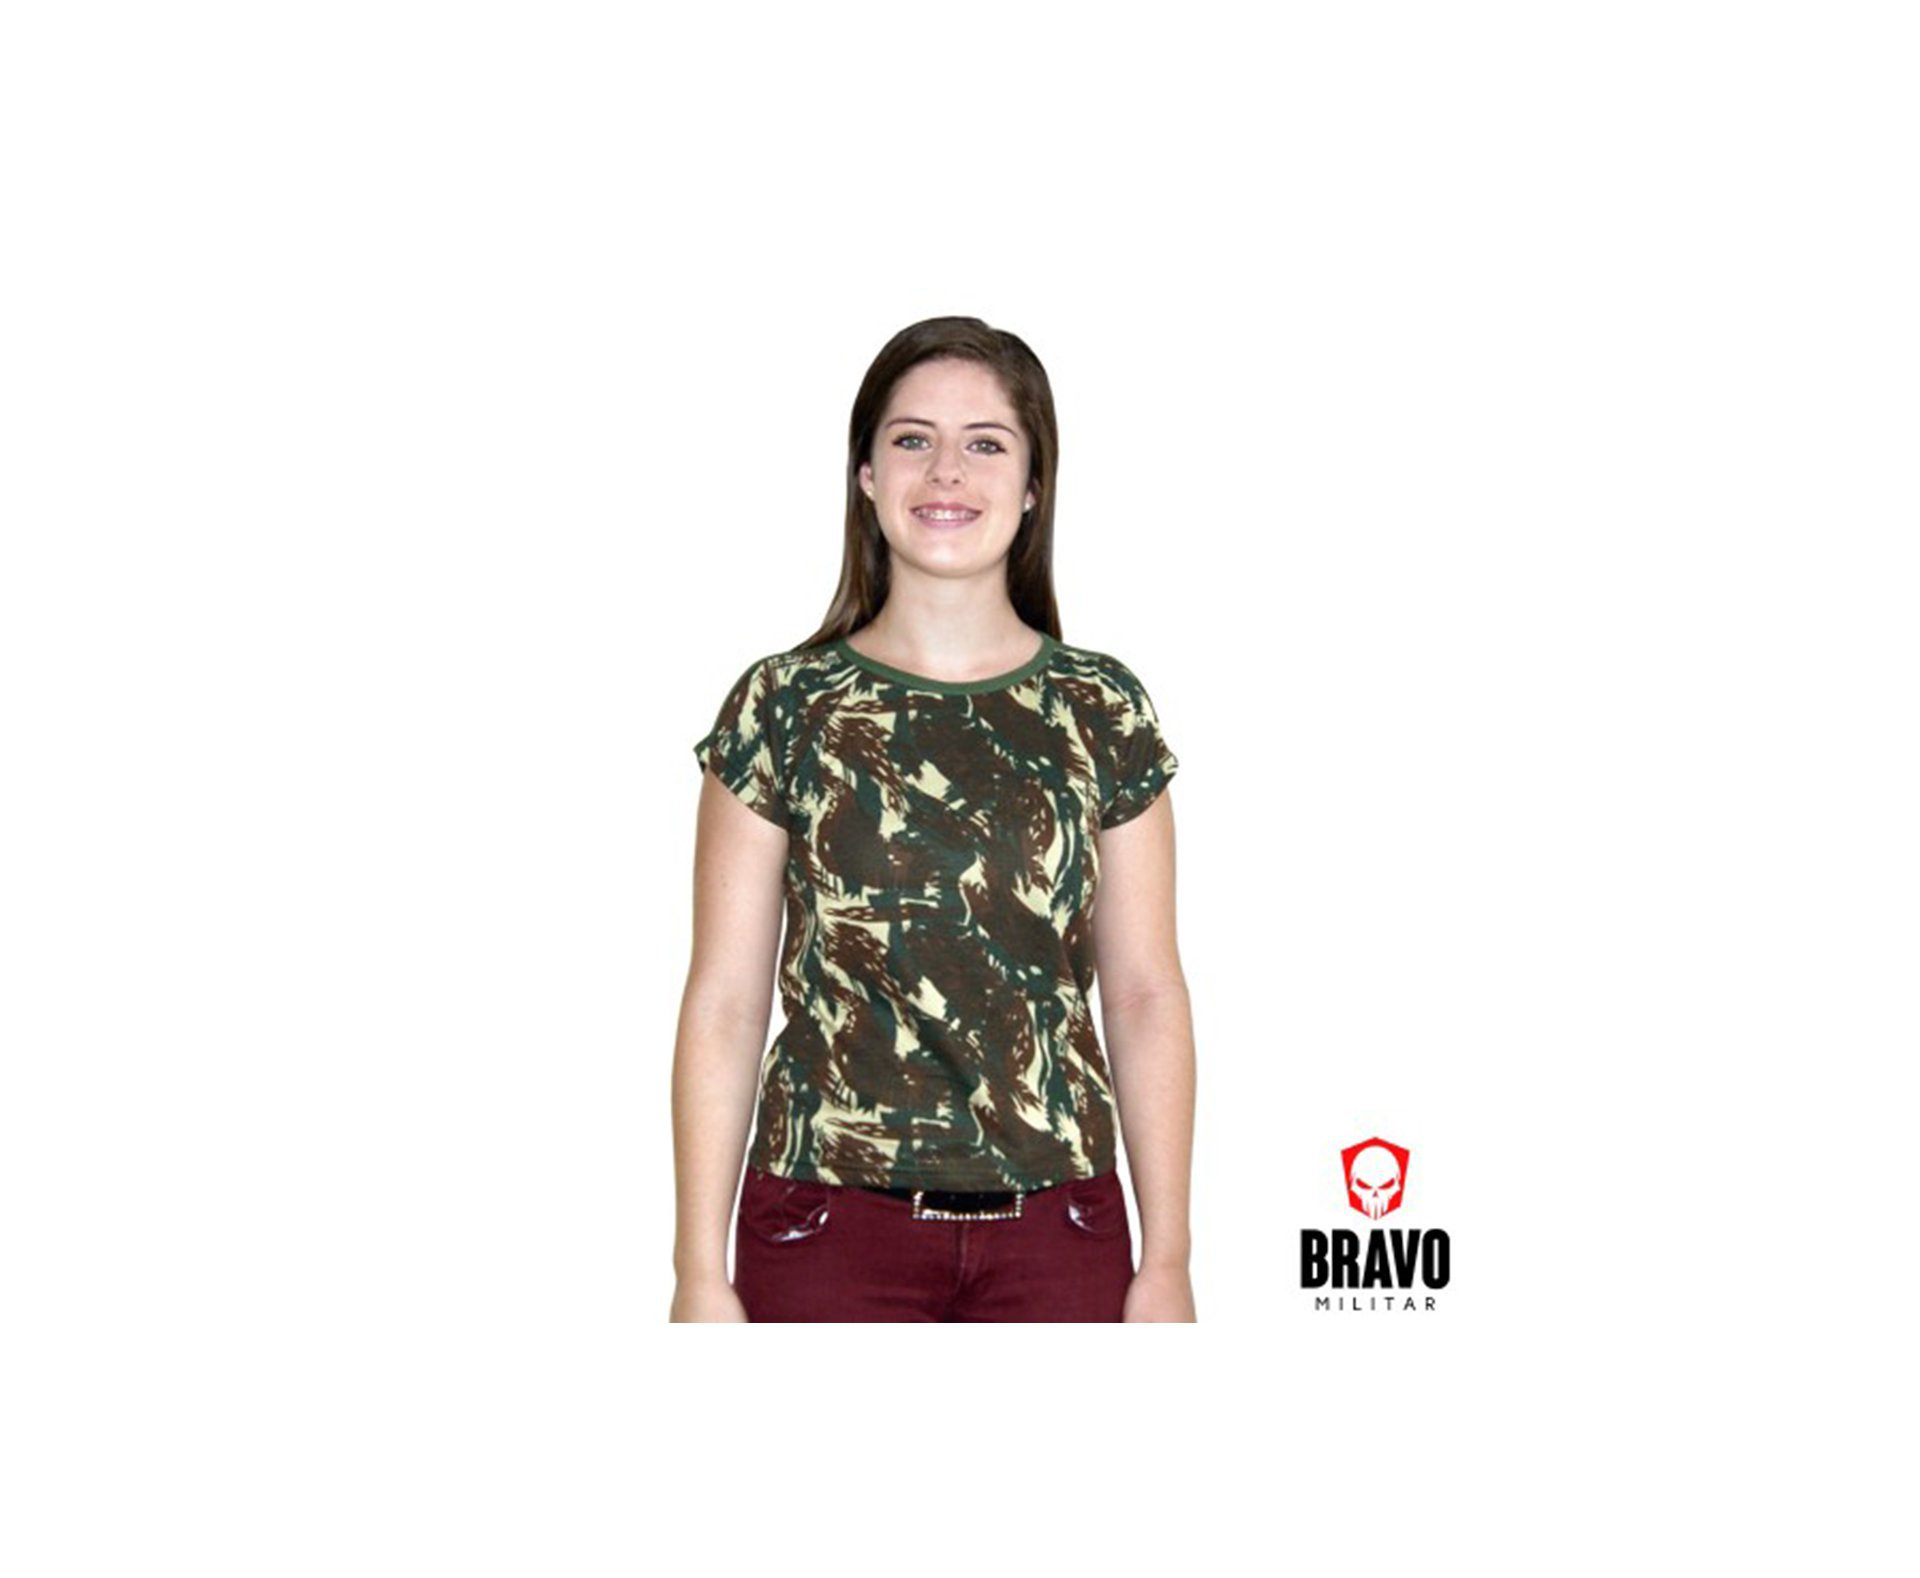 Baby Look Camuflada Exercito 2 - Bravo